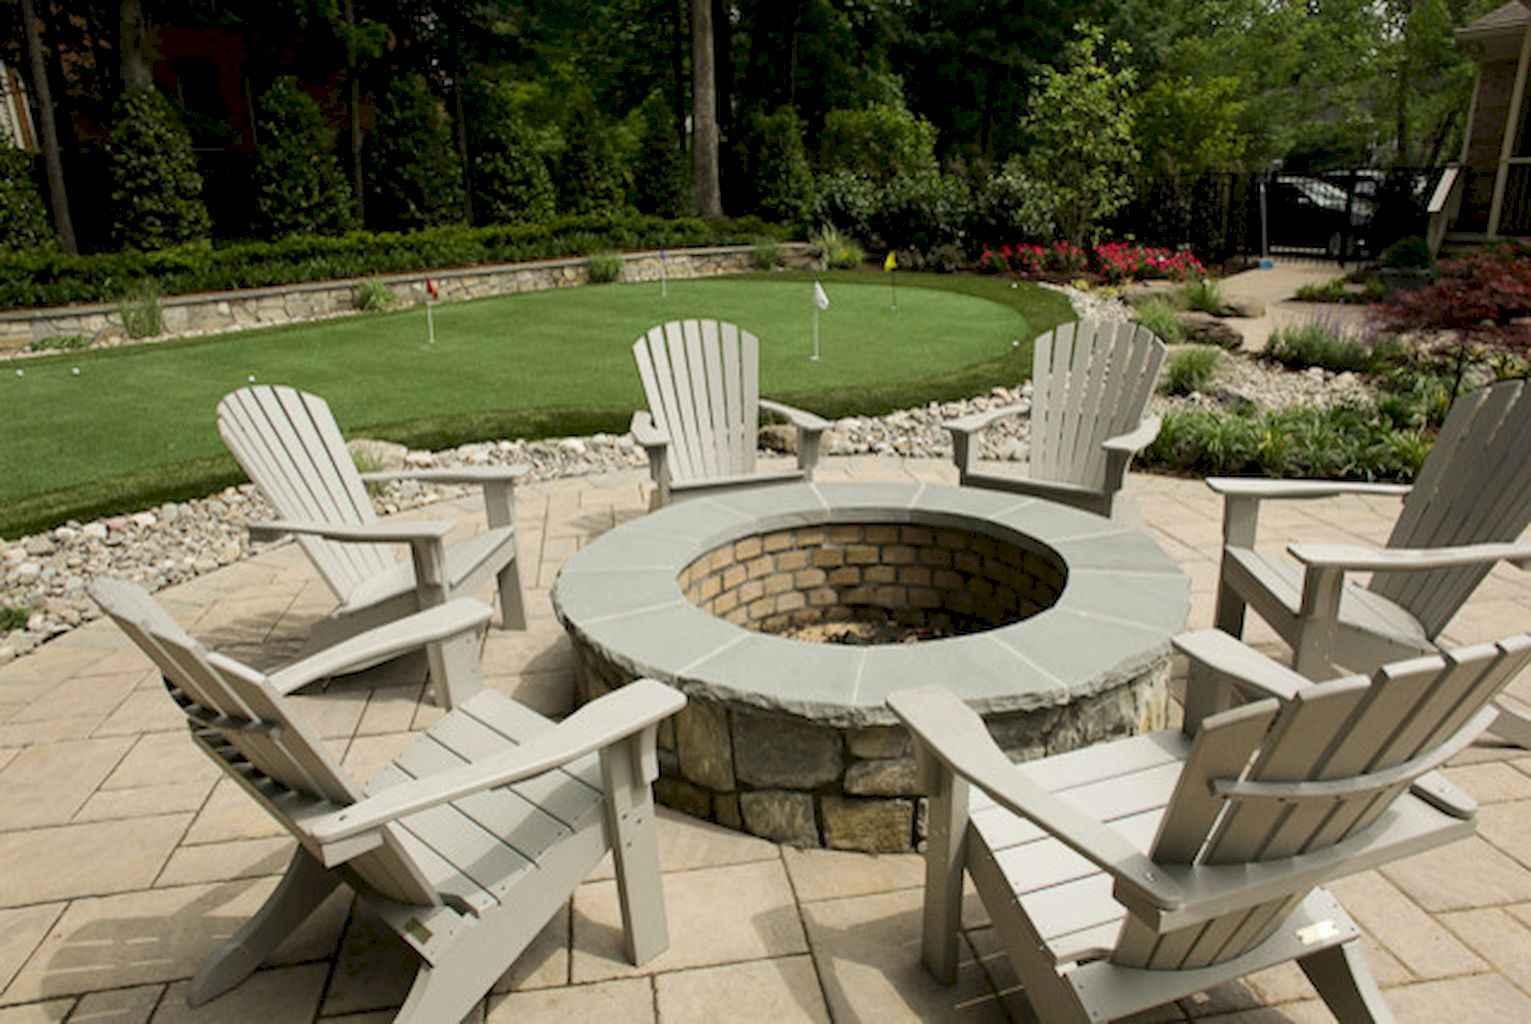 60 Beautiful Backyard Fire Pit Ideas Decoration and Remodel (56)